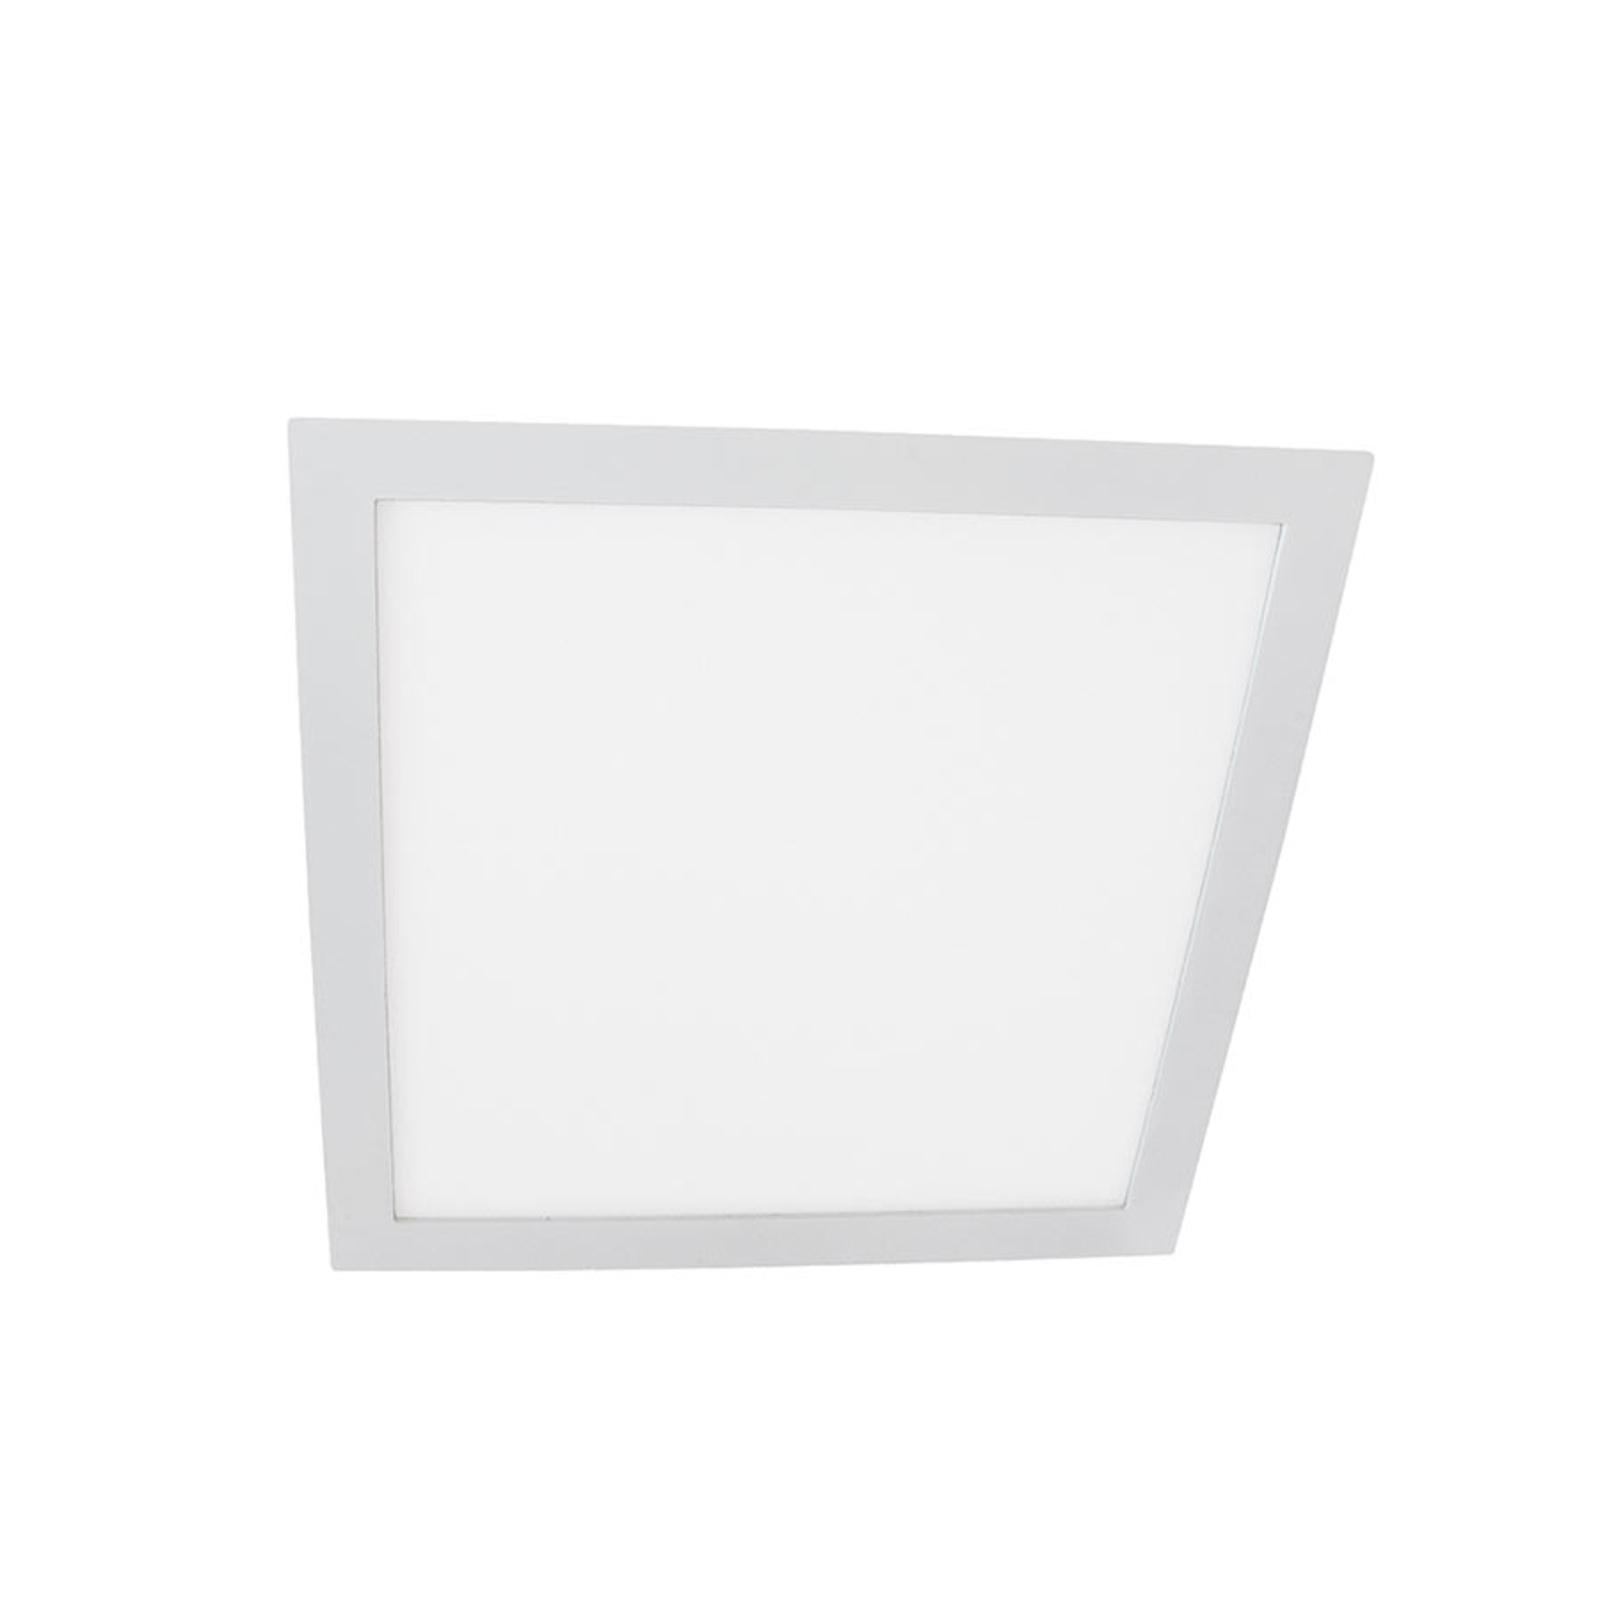 Moon Square LED-downlight 6W, 4 000 K